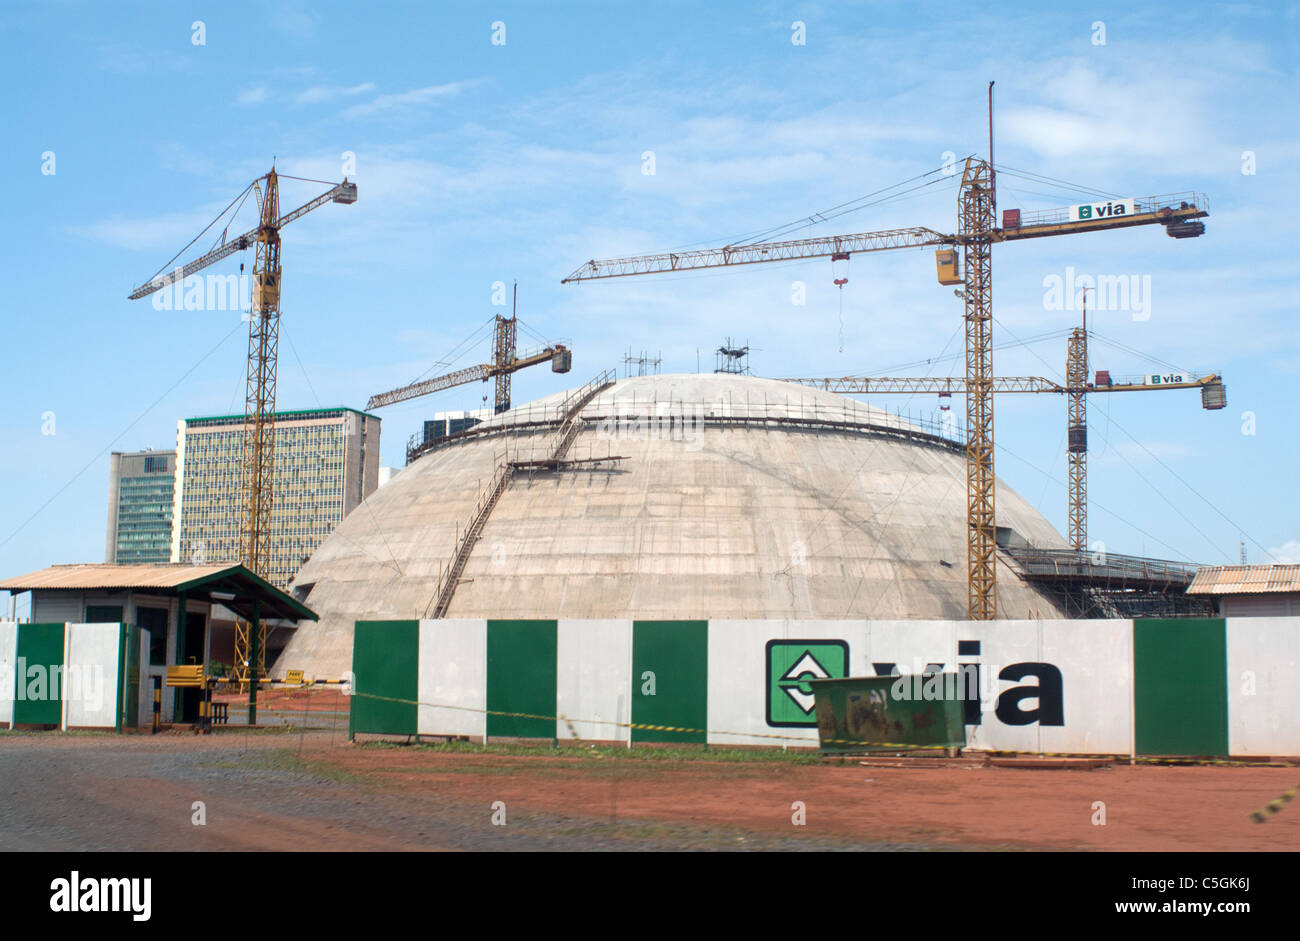 Museu da República, Brasilia, Brazil, under construction (National Museum of the Republic) Stock Photo